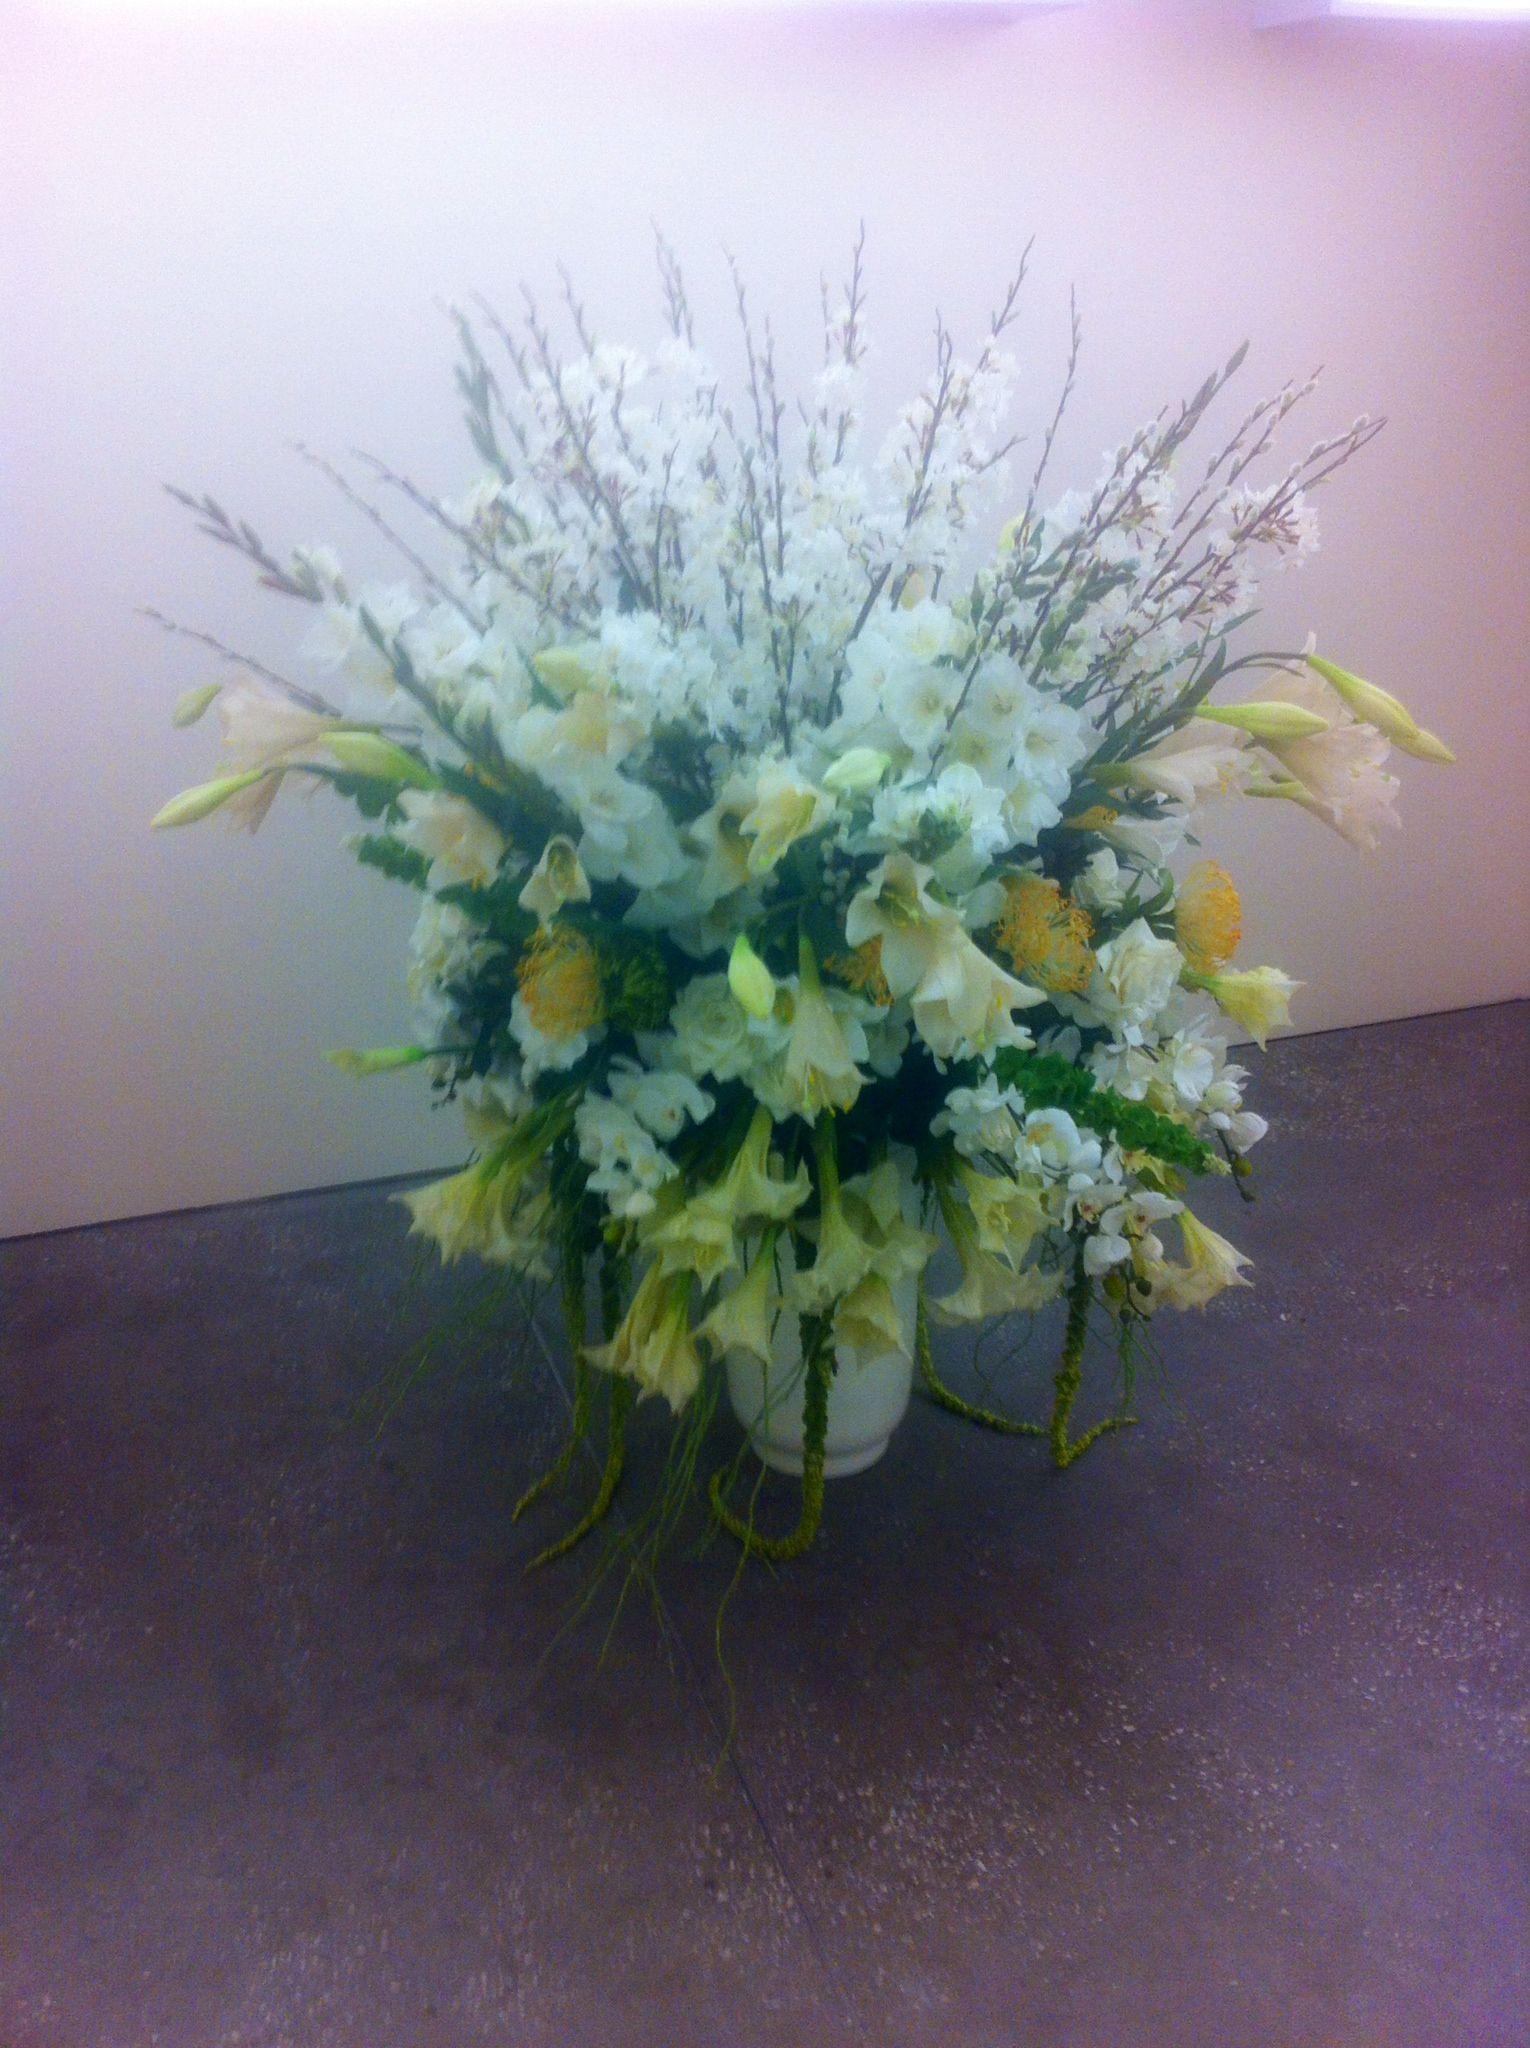 Unnecessarily large and obnoxious flower arrangements.